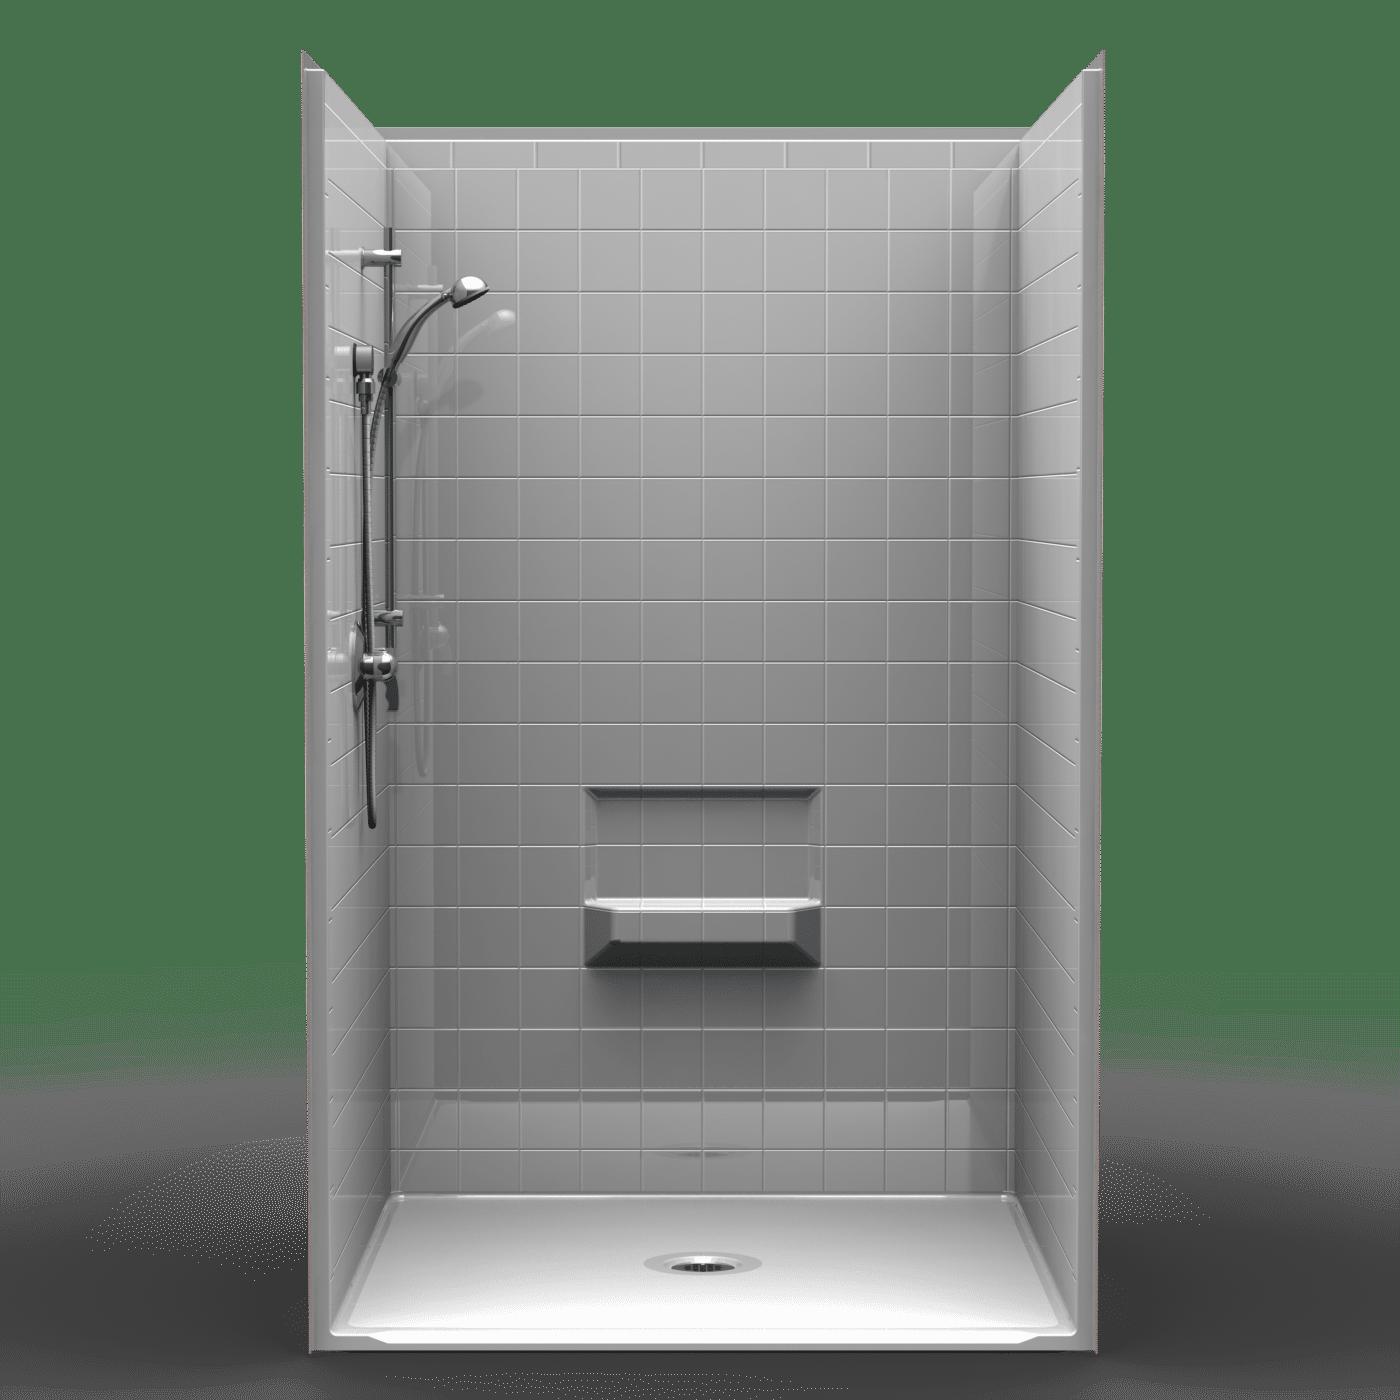 4lrs4848b1b Four Piece 48 X 48 Roll In Shower 1